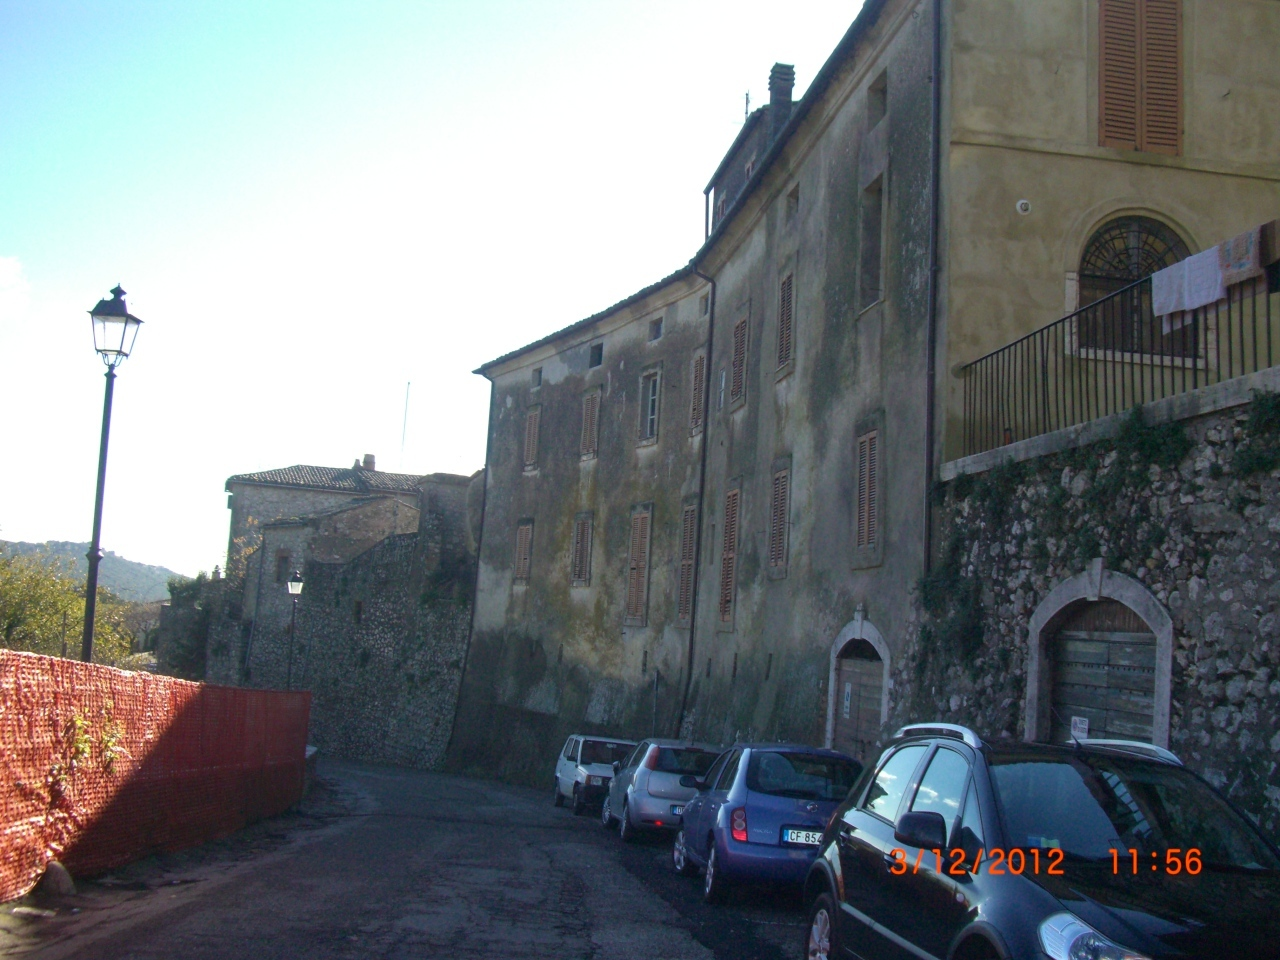 Casa Indipendente in discrete condizioni in vendita Rif. 4155802